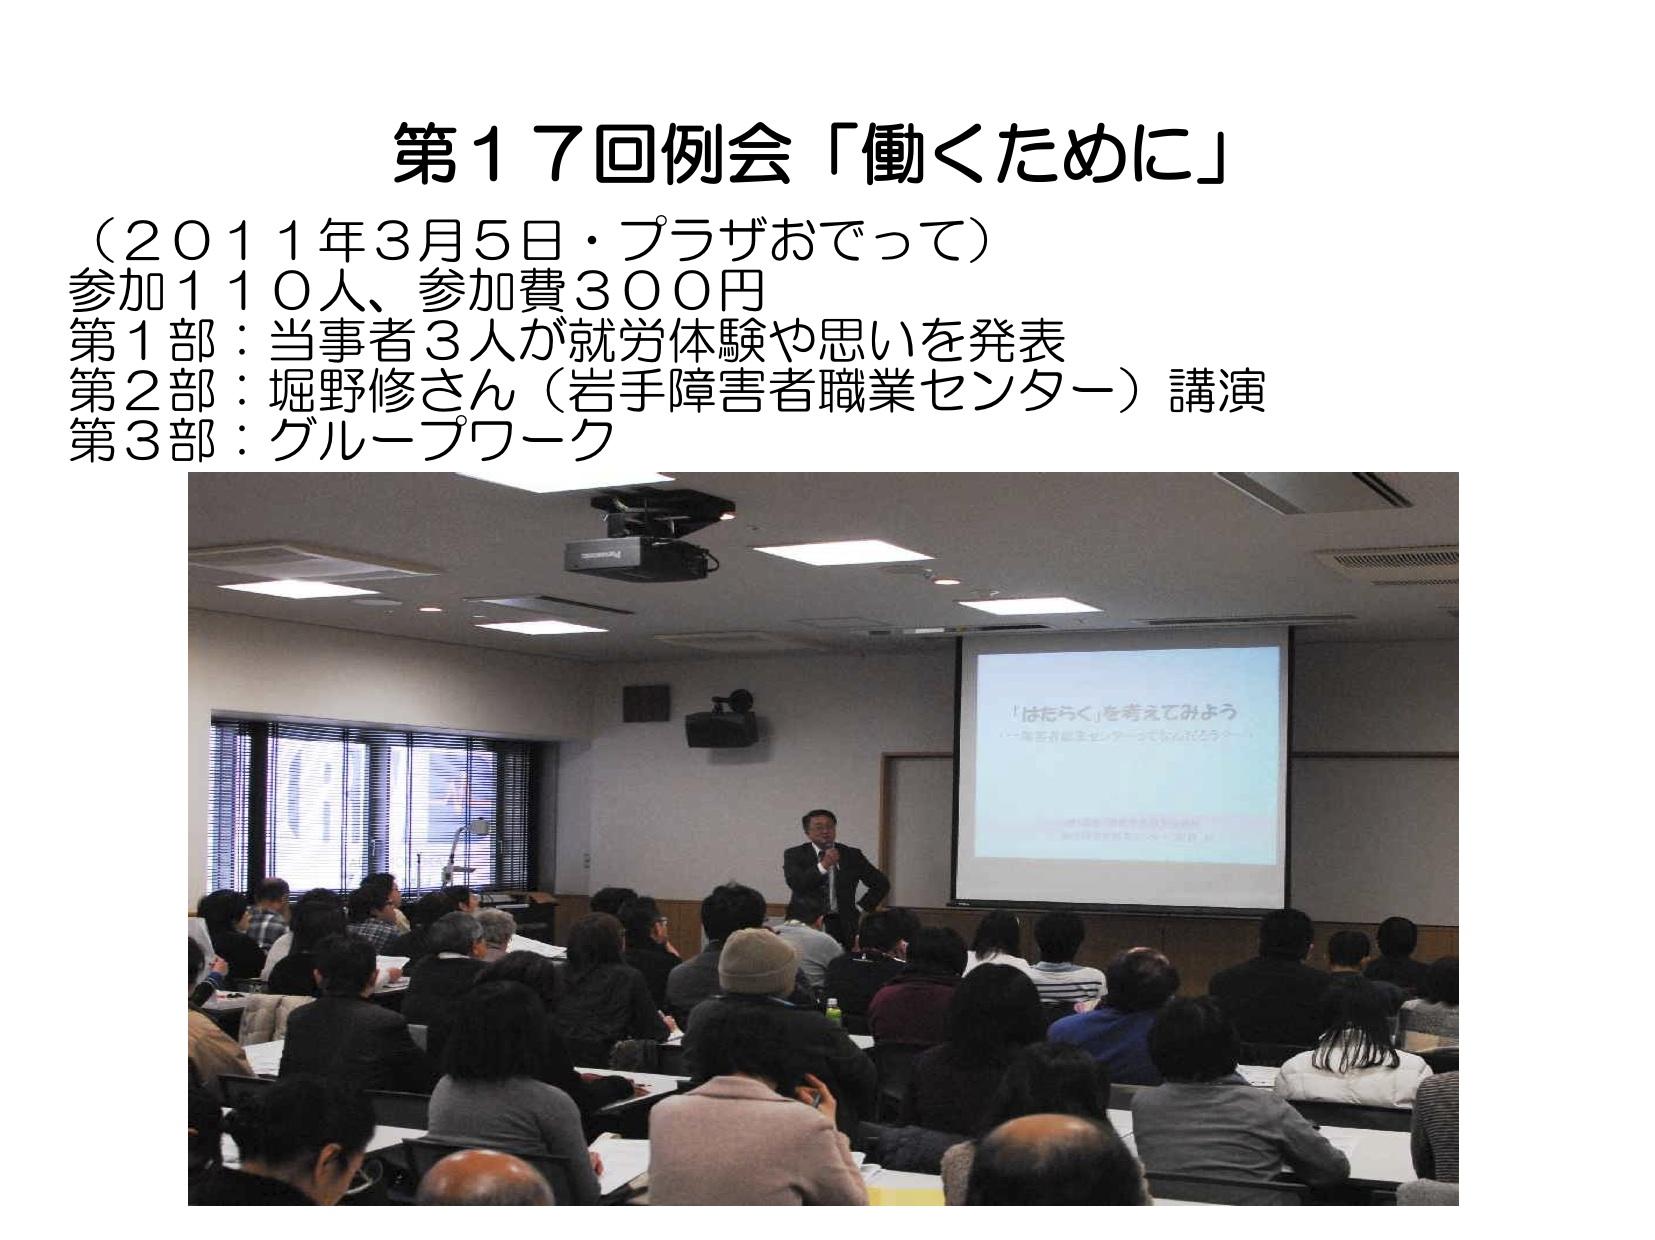 PS養成講座…パワーポイント資料④_a0103650_204959.jpg